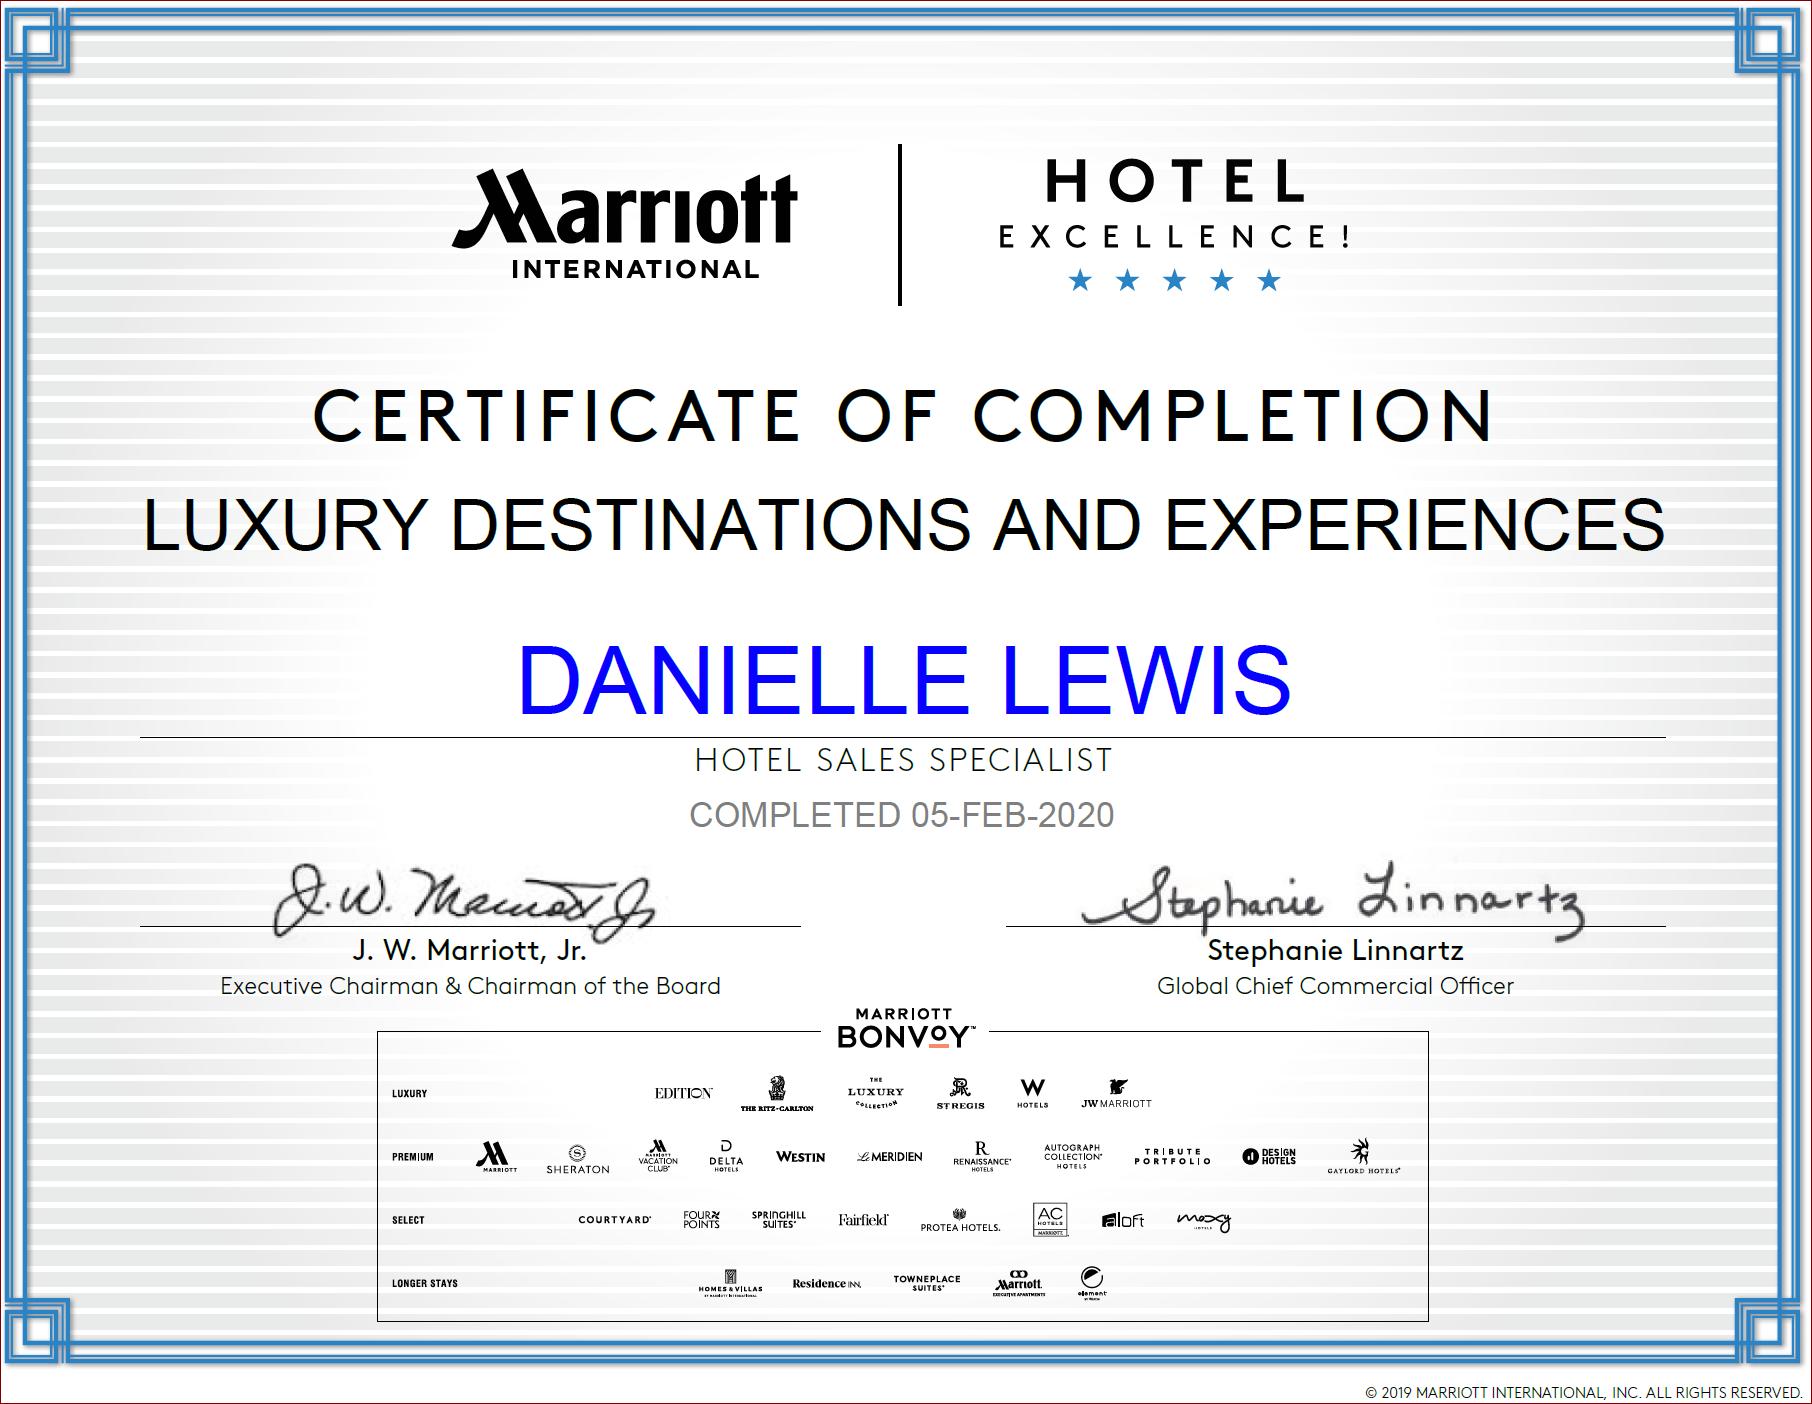 SelfishMe Travel - Marriott International Luxury Destinations and Experiences Certificate